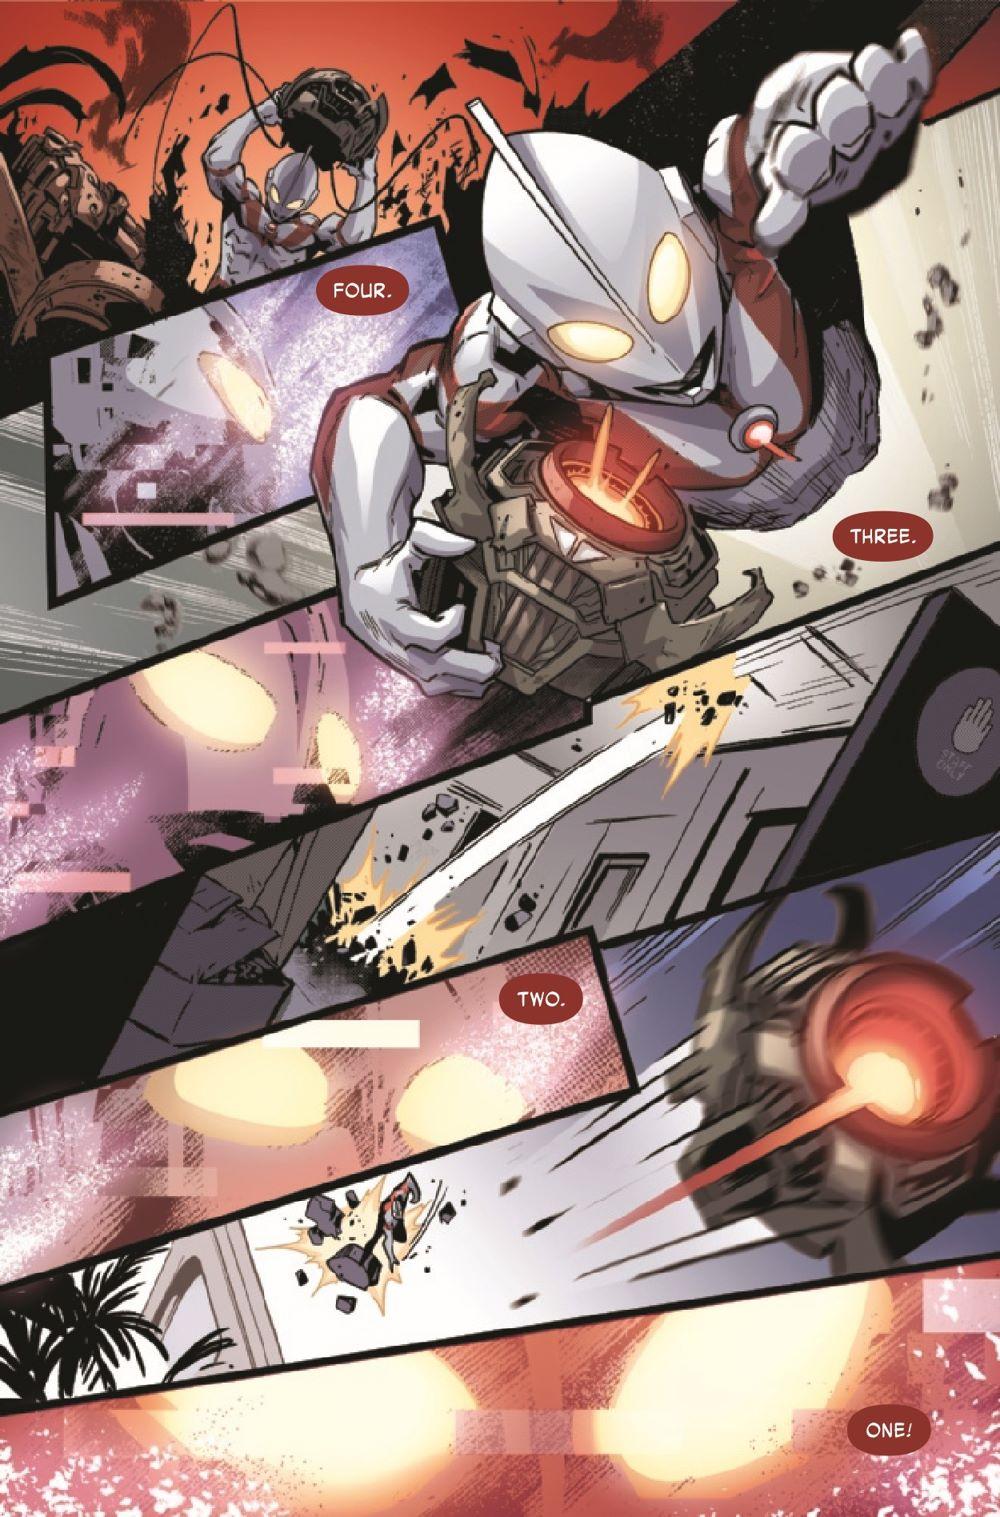 ULTRAMANTRIALS2021003_Preview-5 ComicList Previews: TRIALS OF ULTRAMAN #3 (OF 5)